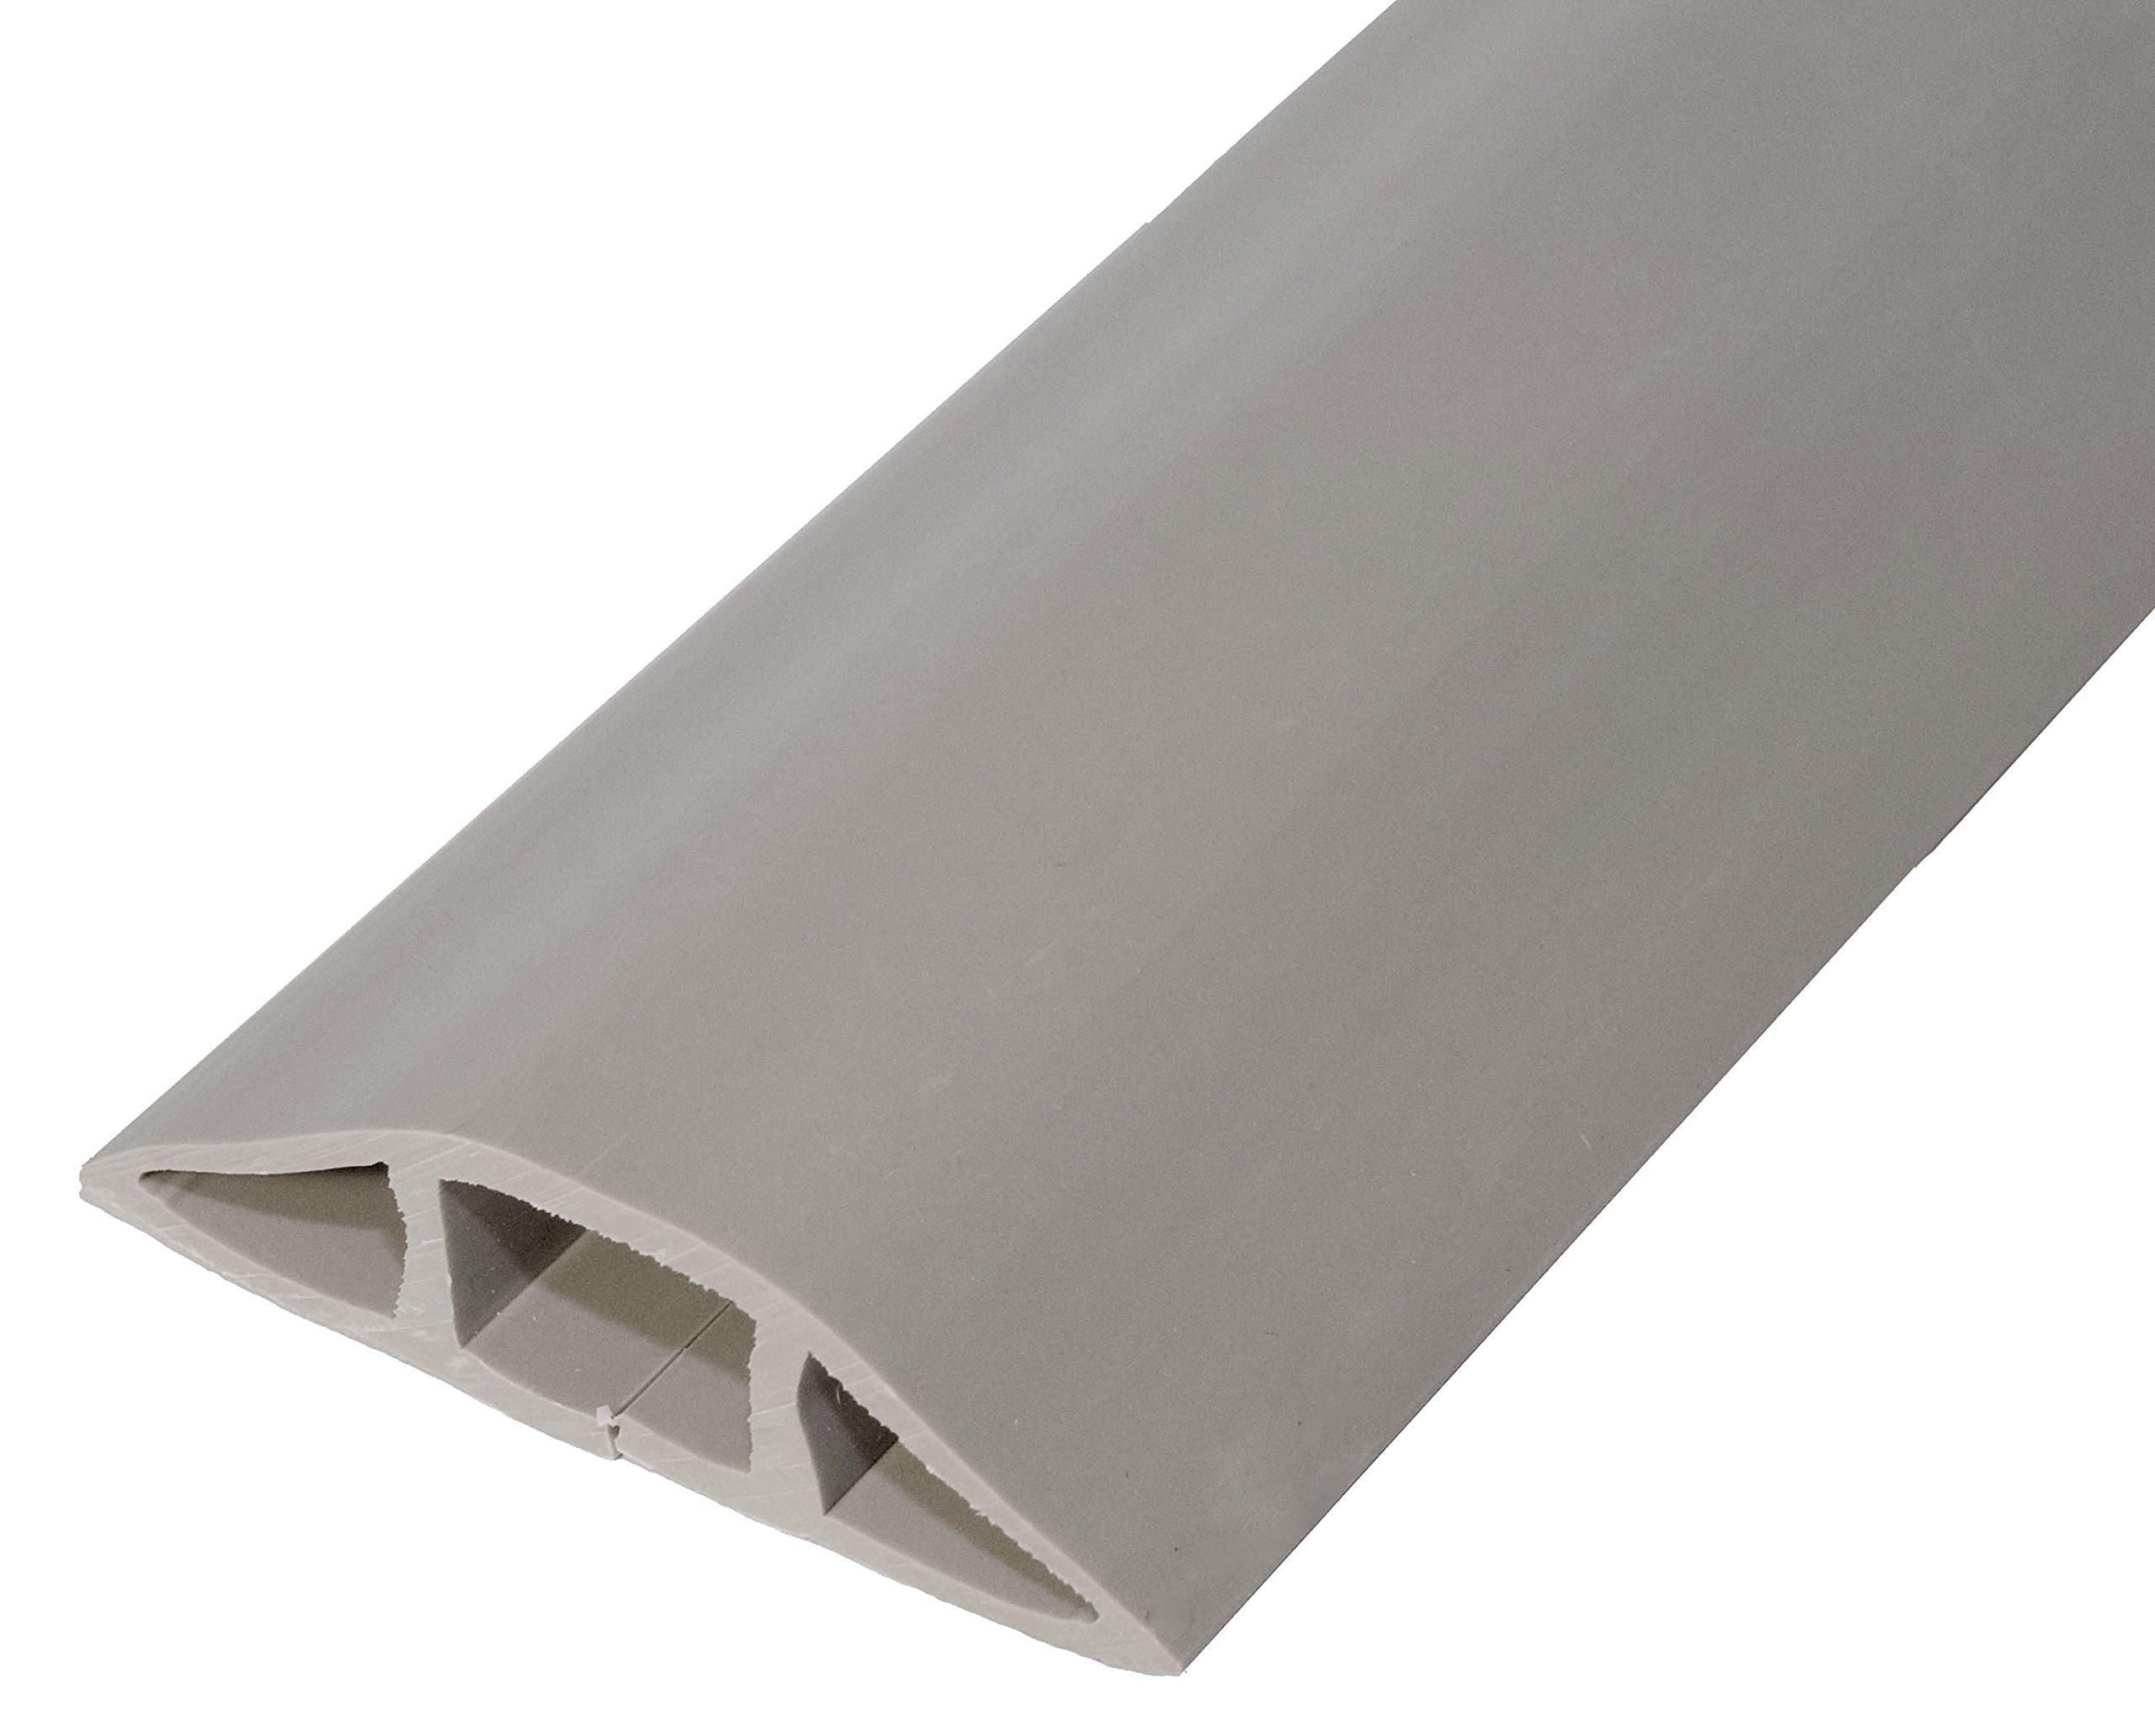 Floor Ramp Cord Management (6 Feet (182cm))